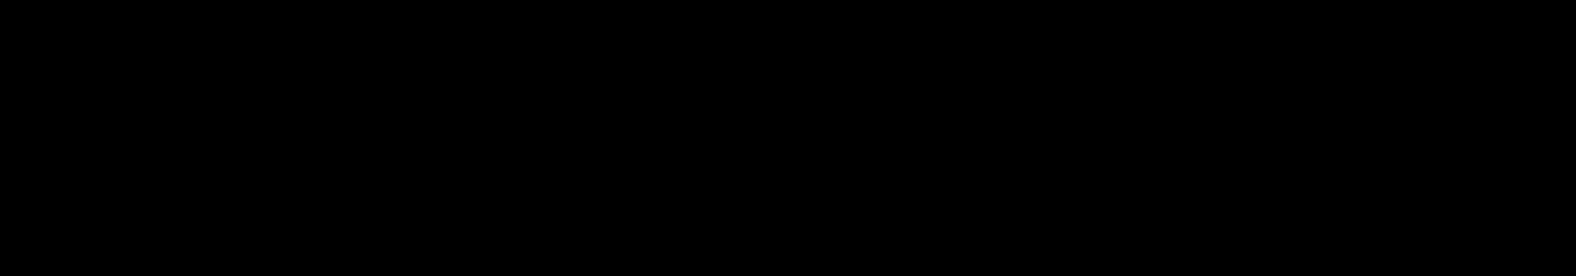 Xelen